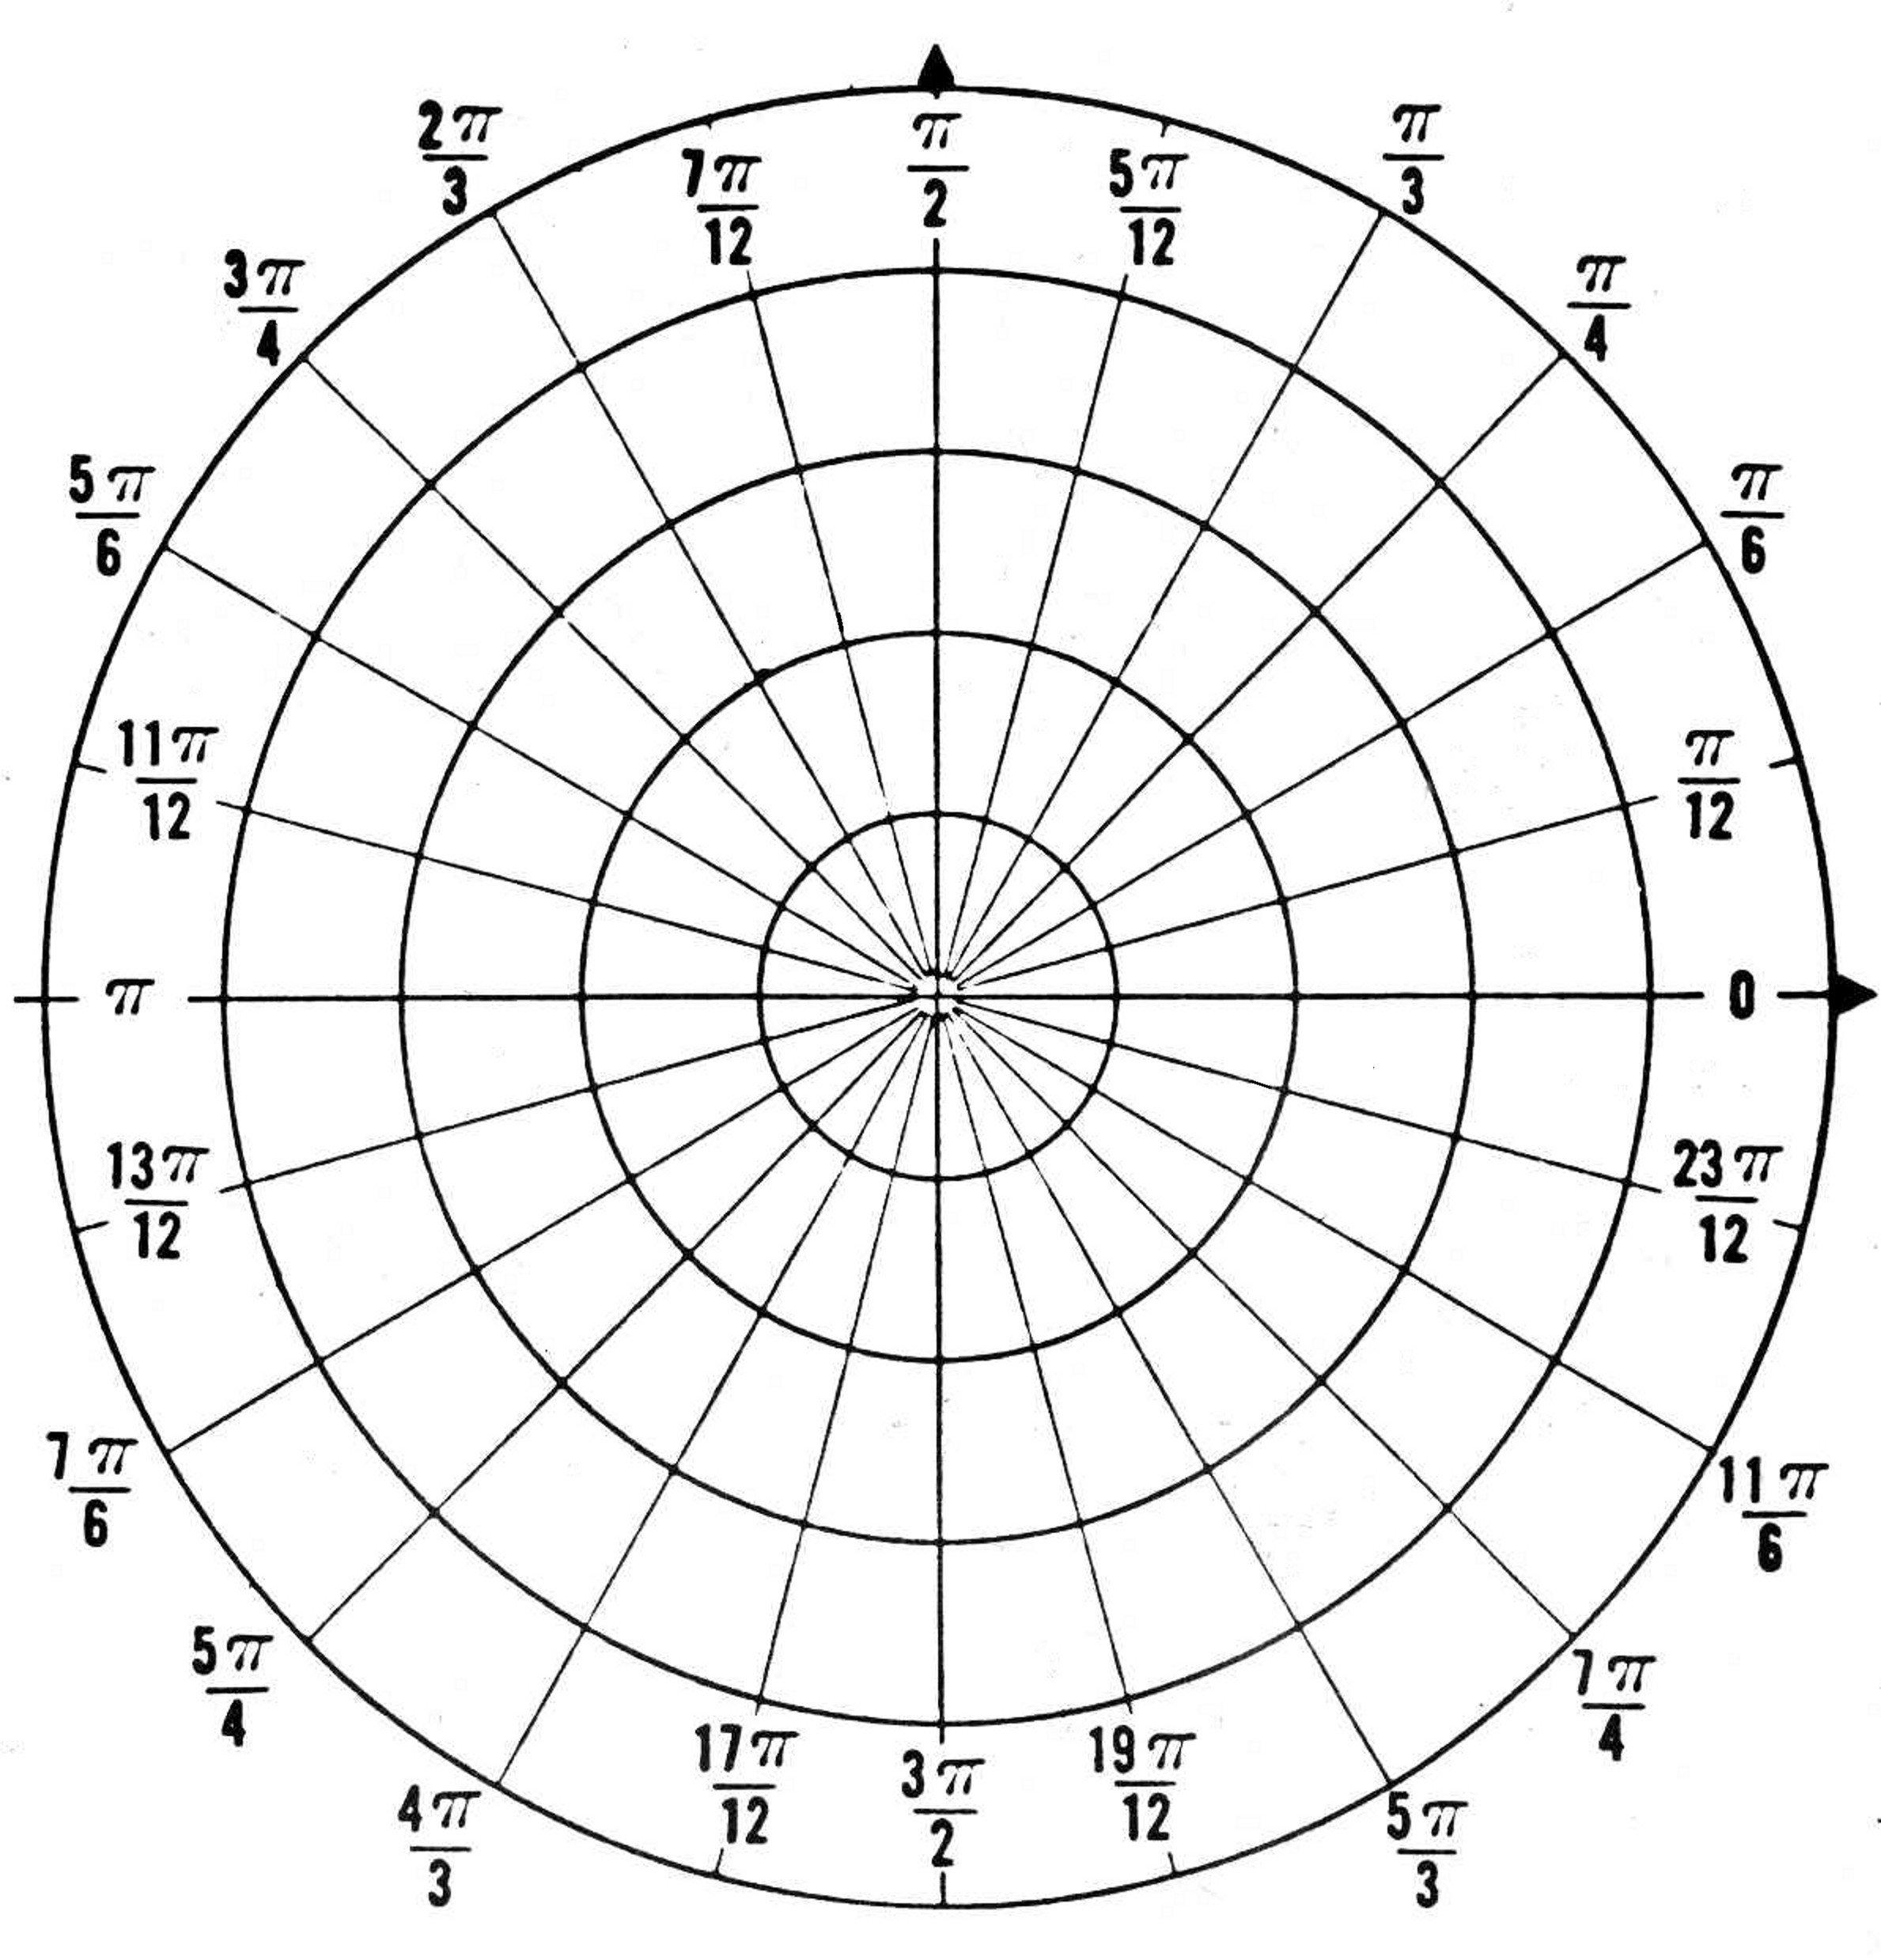 Polar Coordinate Graph Paper Classwork and Homework for Fp1 Lessons 21 25 Plex